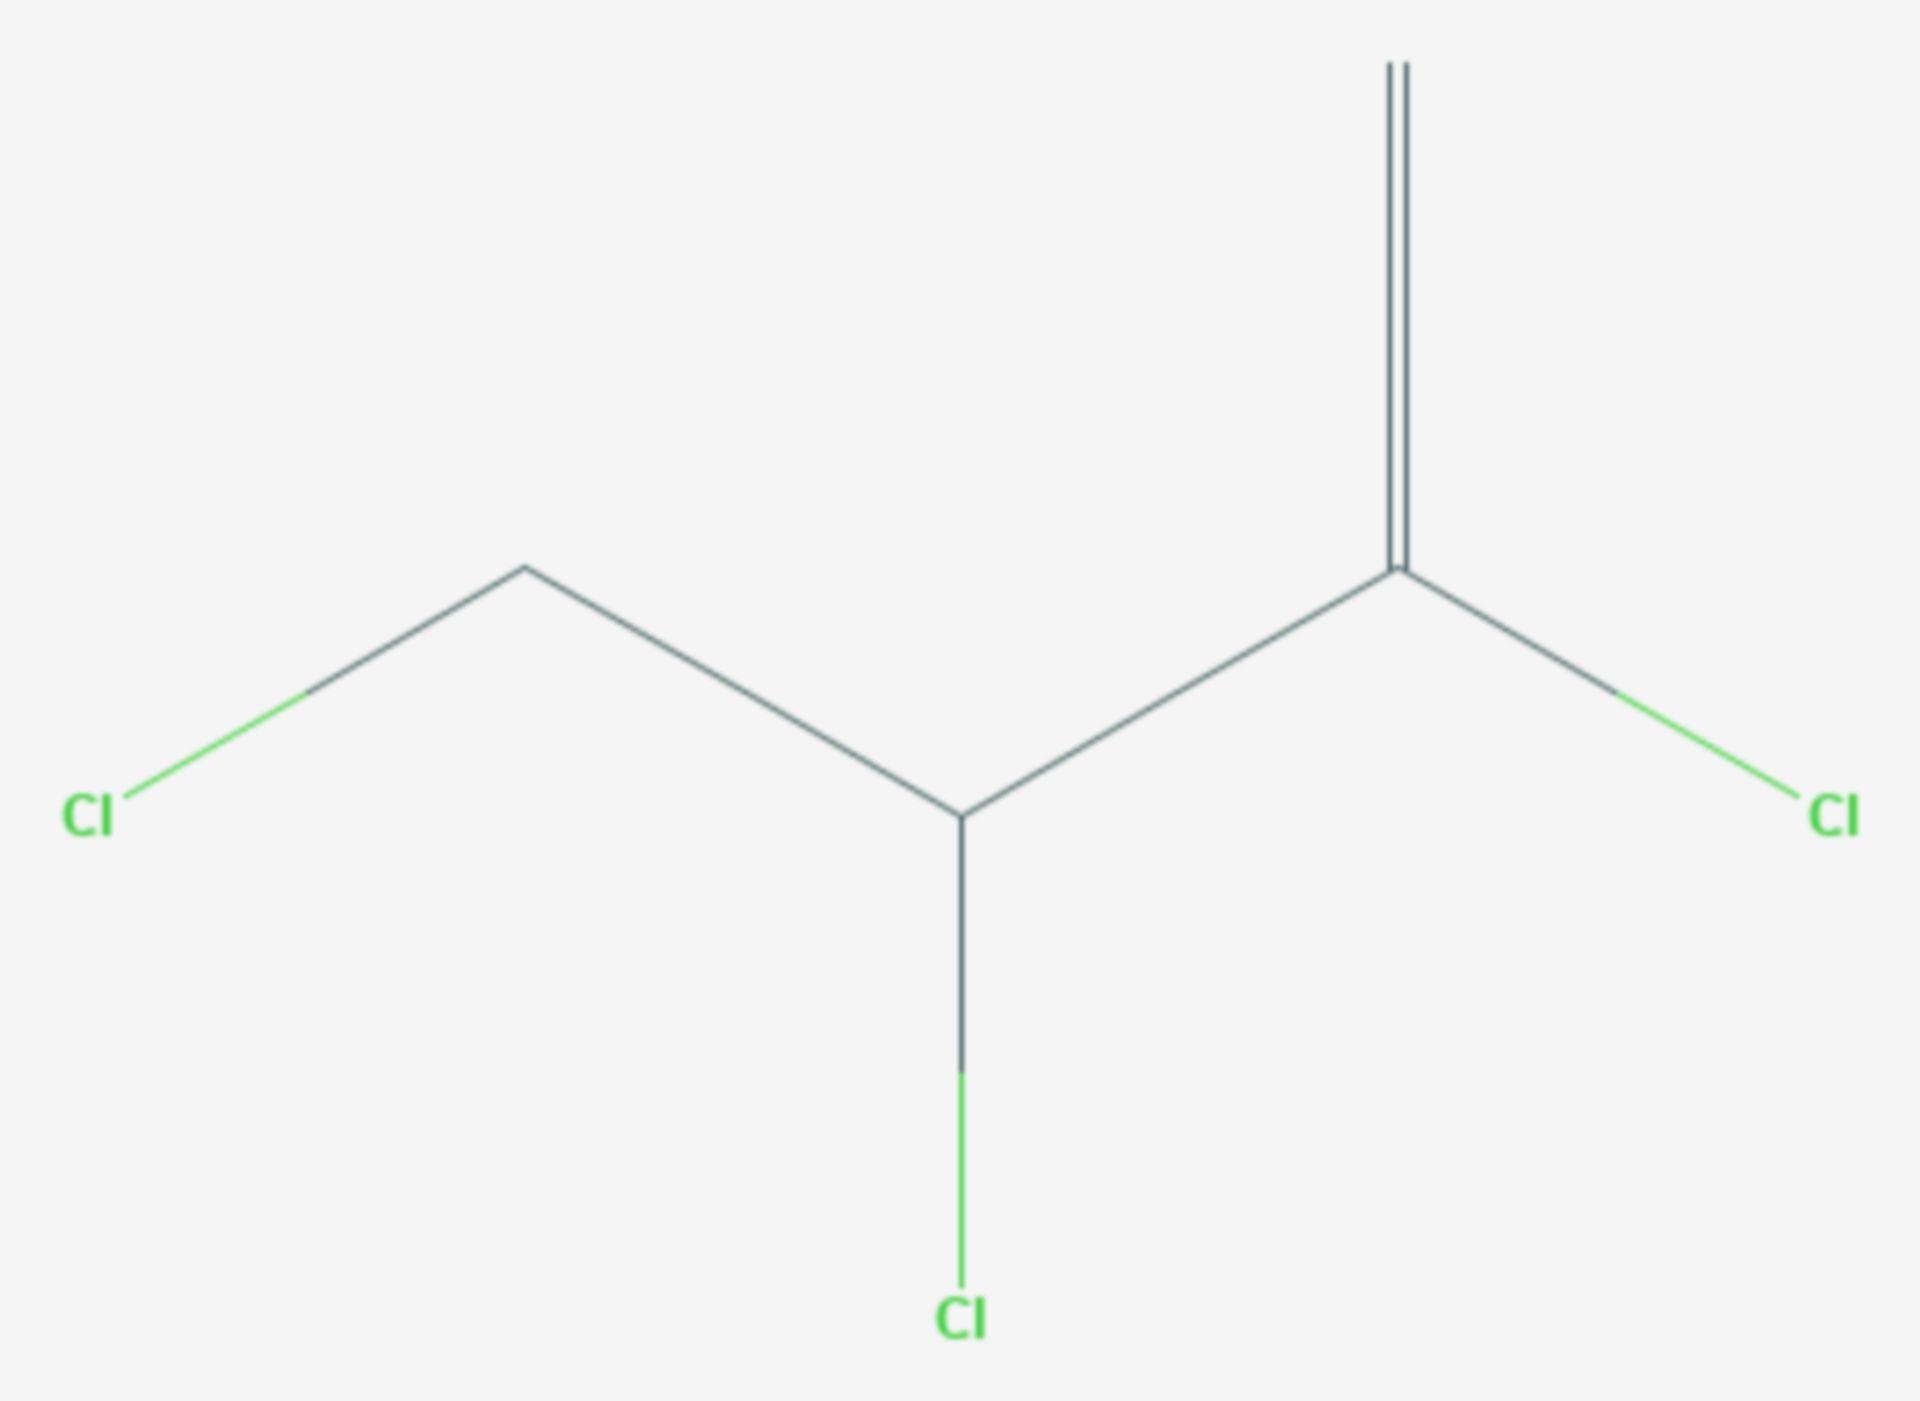 2,3,4-Trichlor-1-buten (Strukturformel)